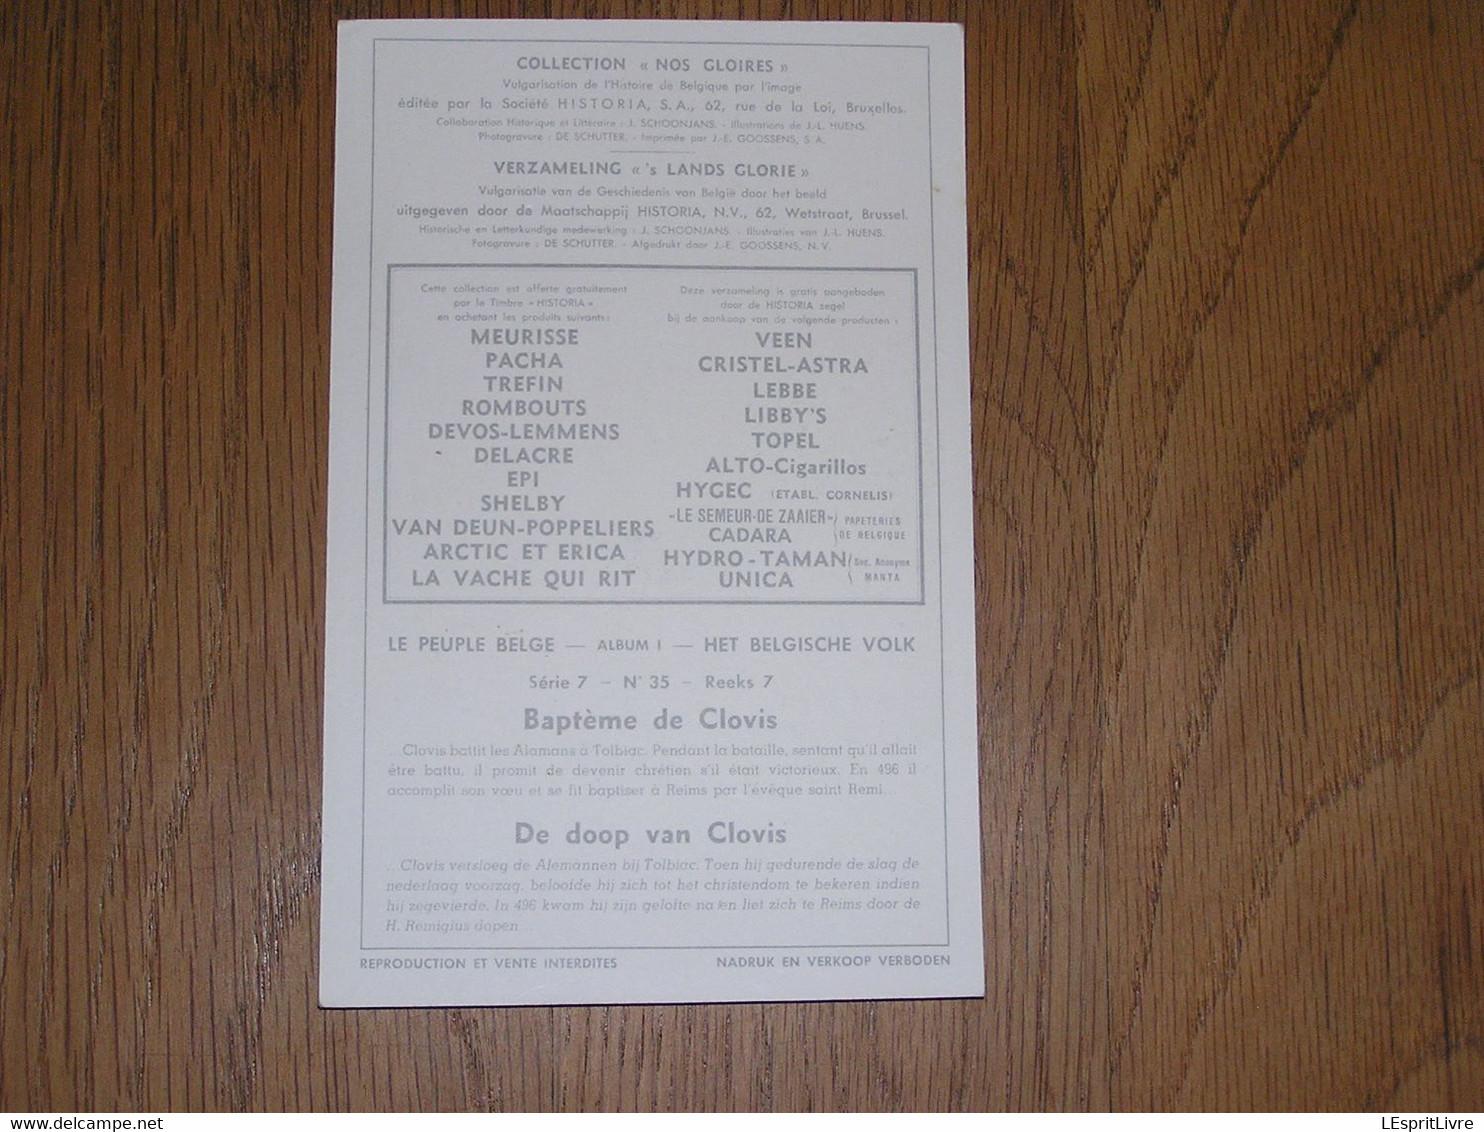 Le Peuple Belge Chromo N° 35 Baptême De Clovis Moyen Age Huens Collection Nos Gloires Histoire Chromos Trading Card - Artis Historia